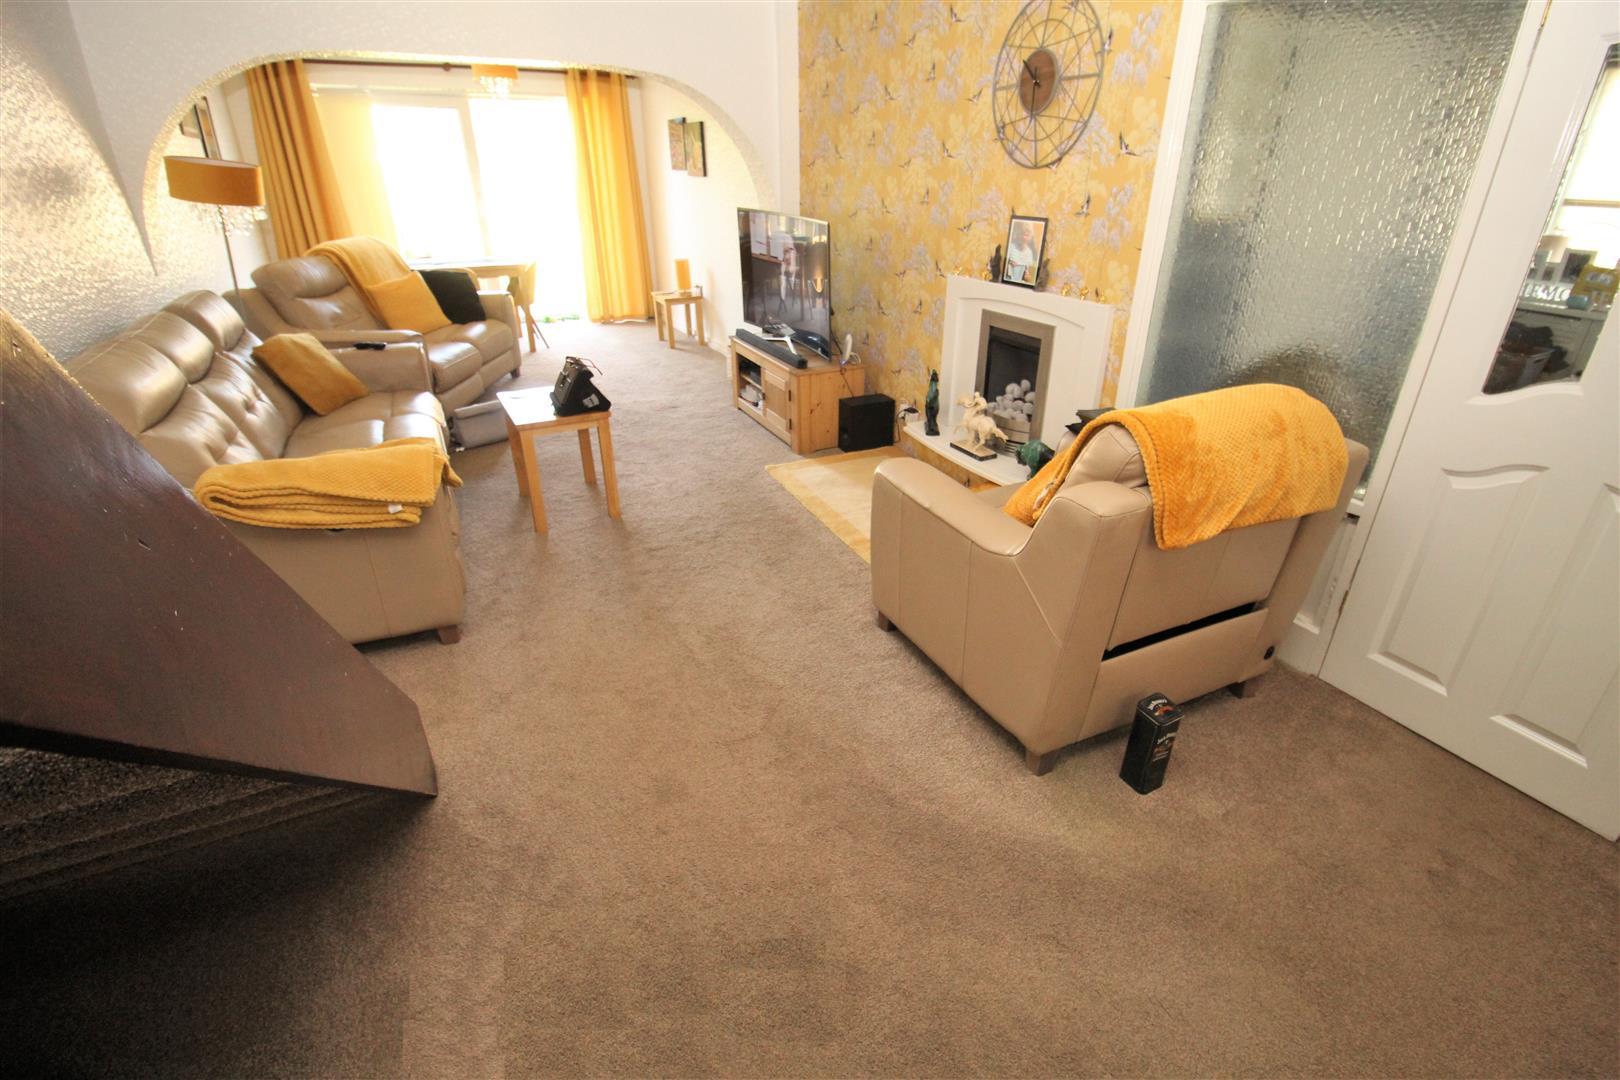 4 Bedrooms, Bungalow - Semi Detached, Dunlop Drive, Melling, Liverpool